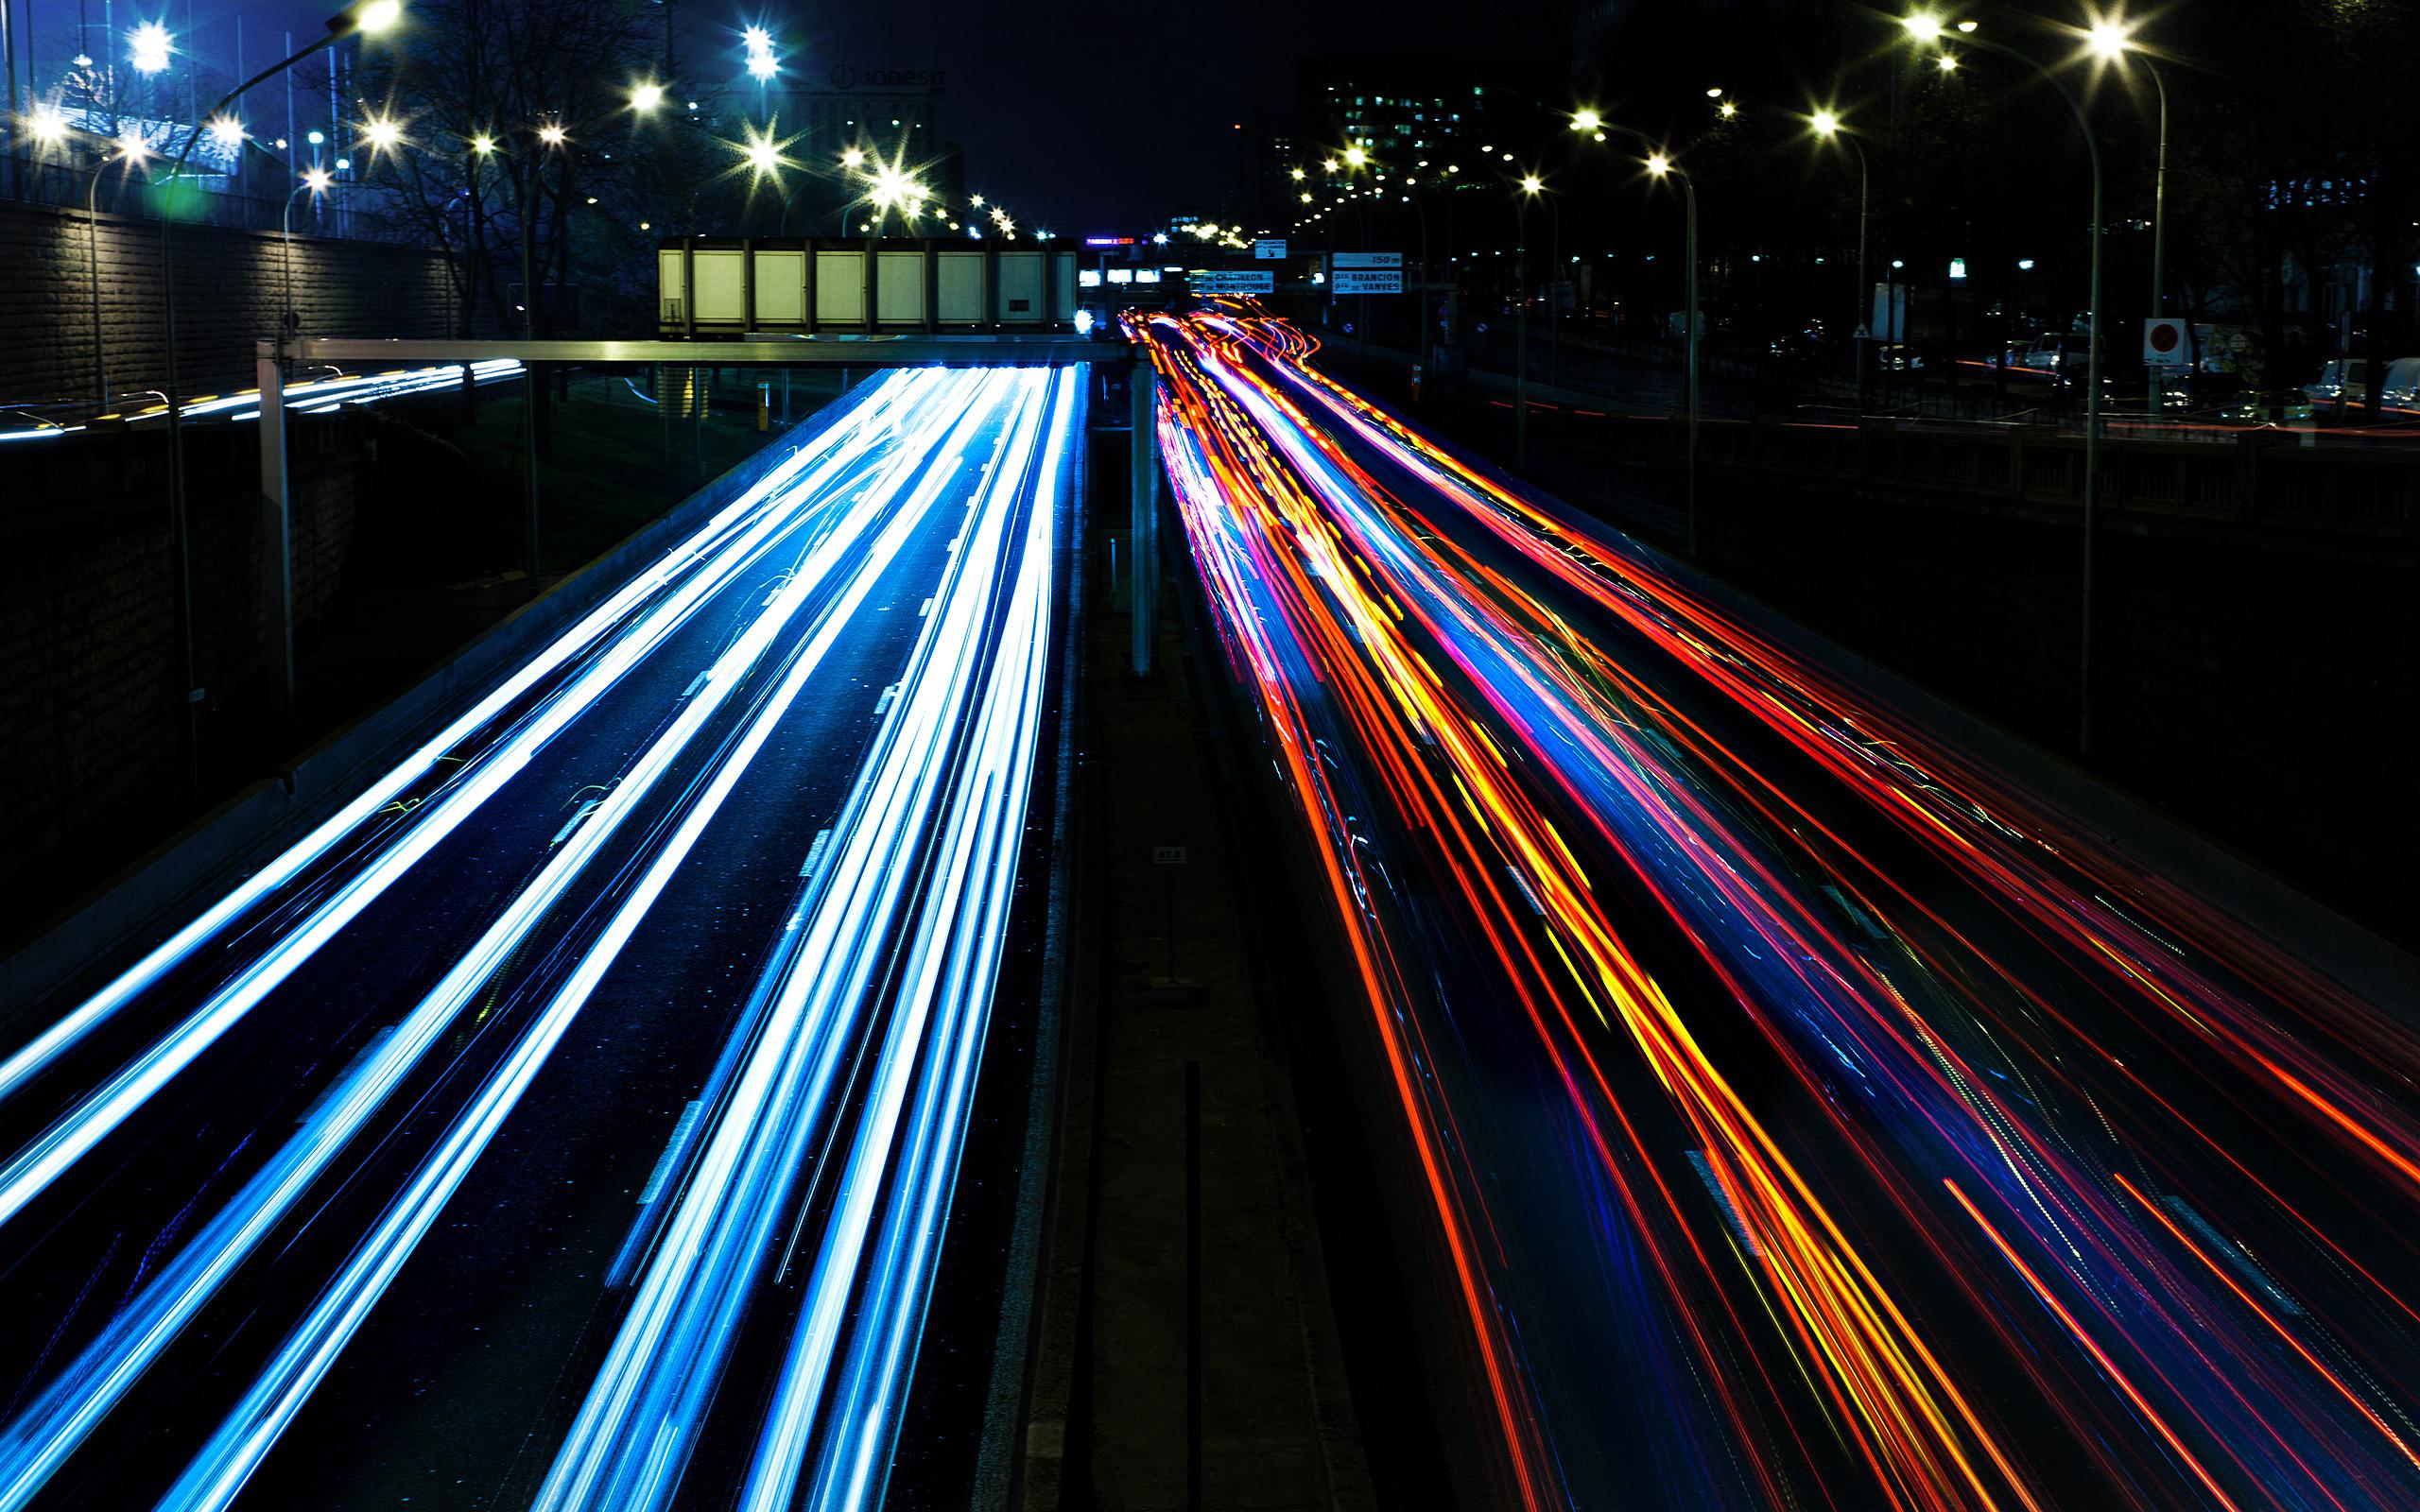 car-lights-big-city-streets-night-2560×1600.jpg   THE PILYO NEXT DOOR